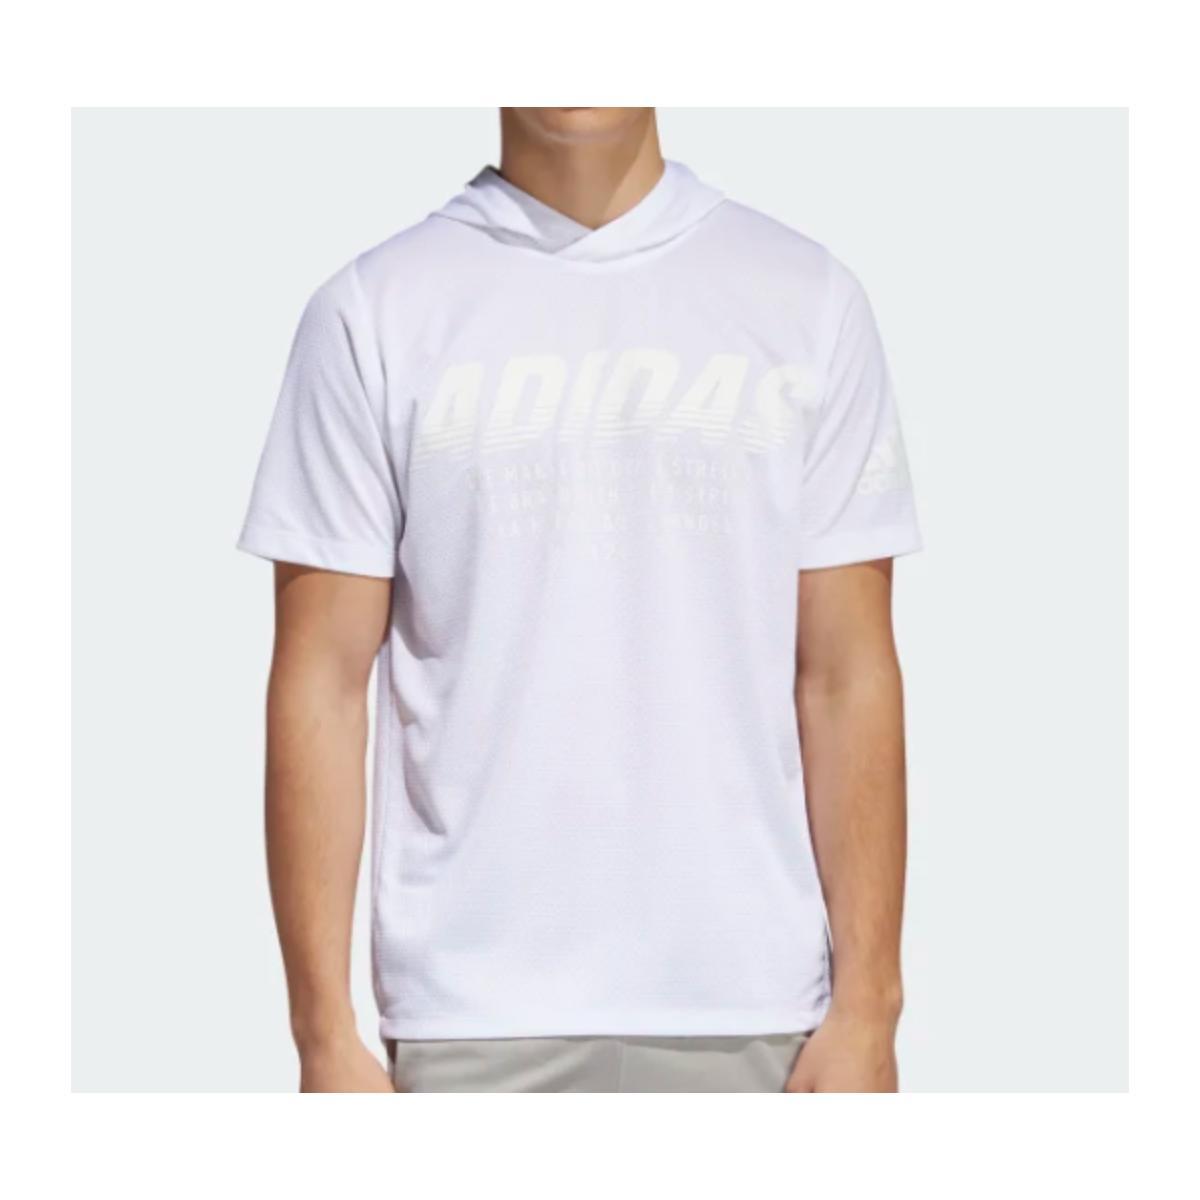 Camiseta Masculina Adidas Dy0742 Daily Hoody Tee Branco